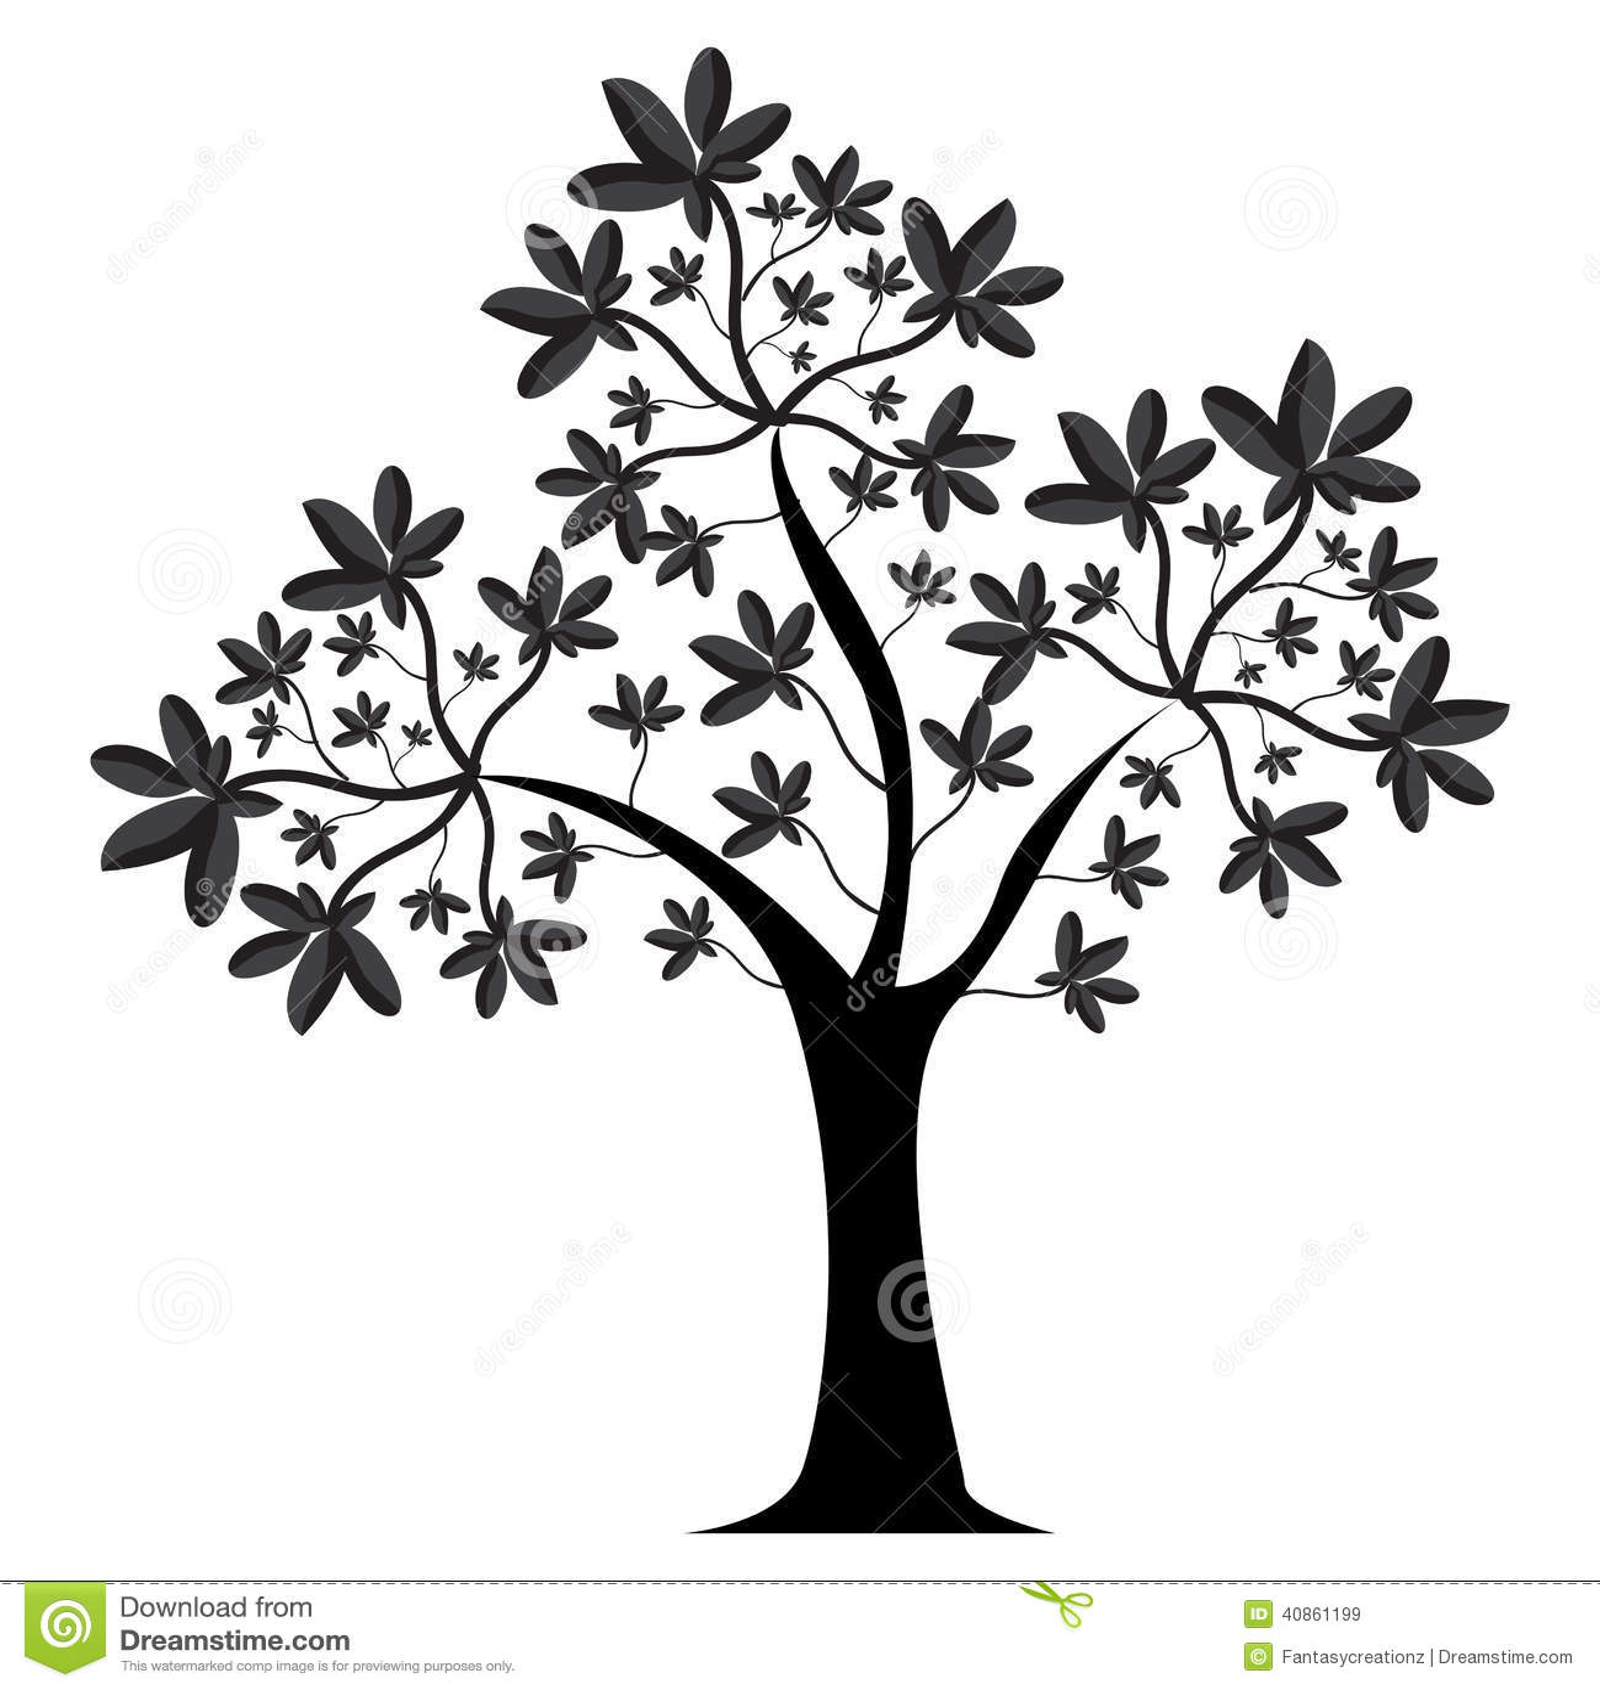 Tree Silhouette Stock Vector - Image: 40861199